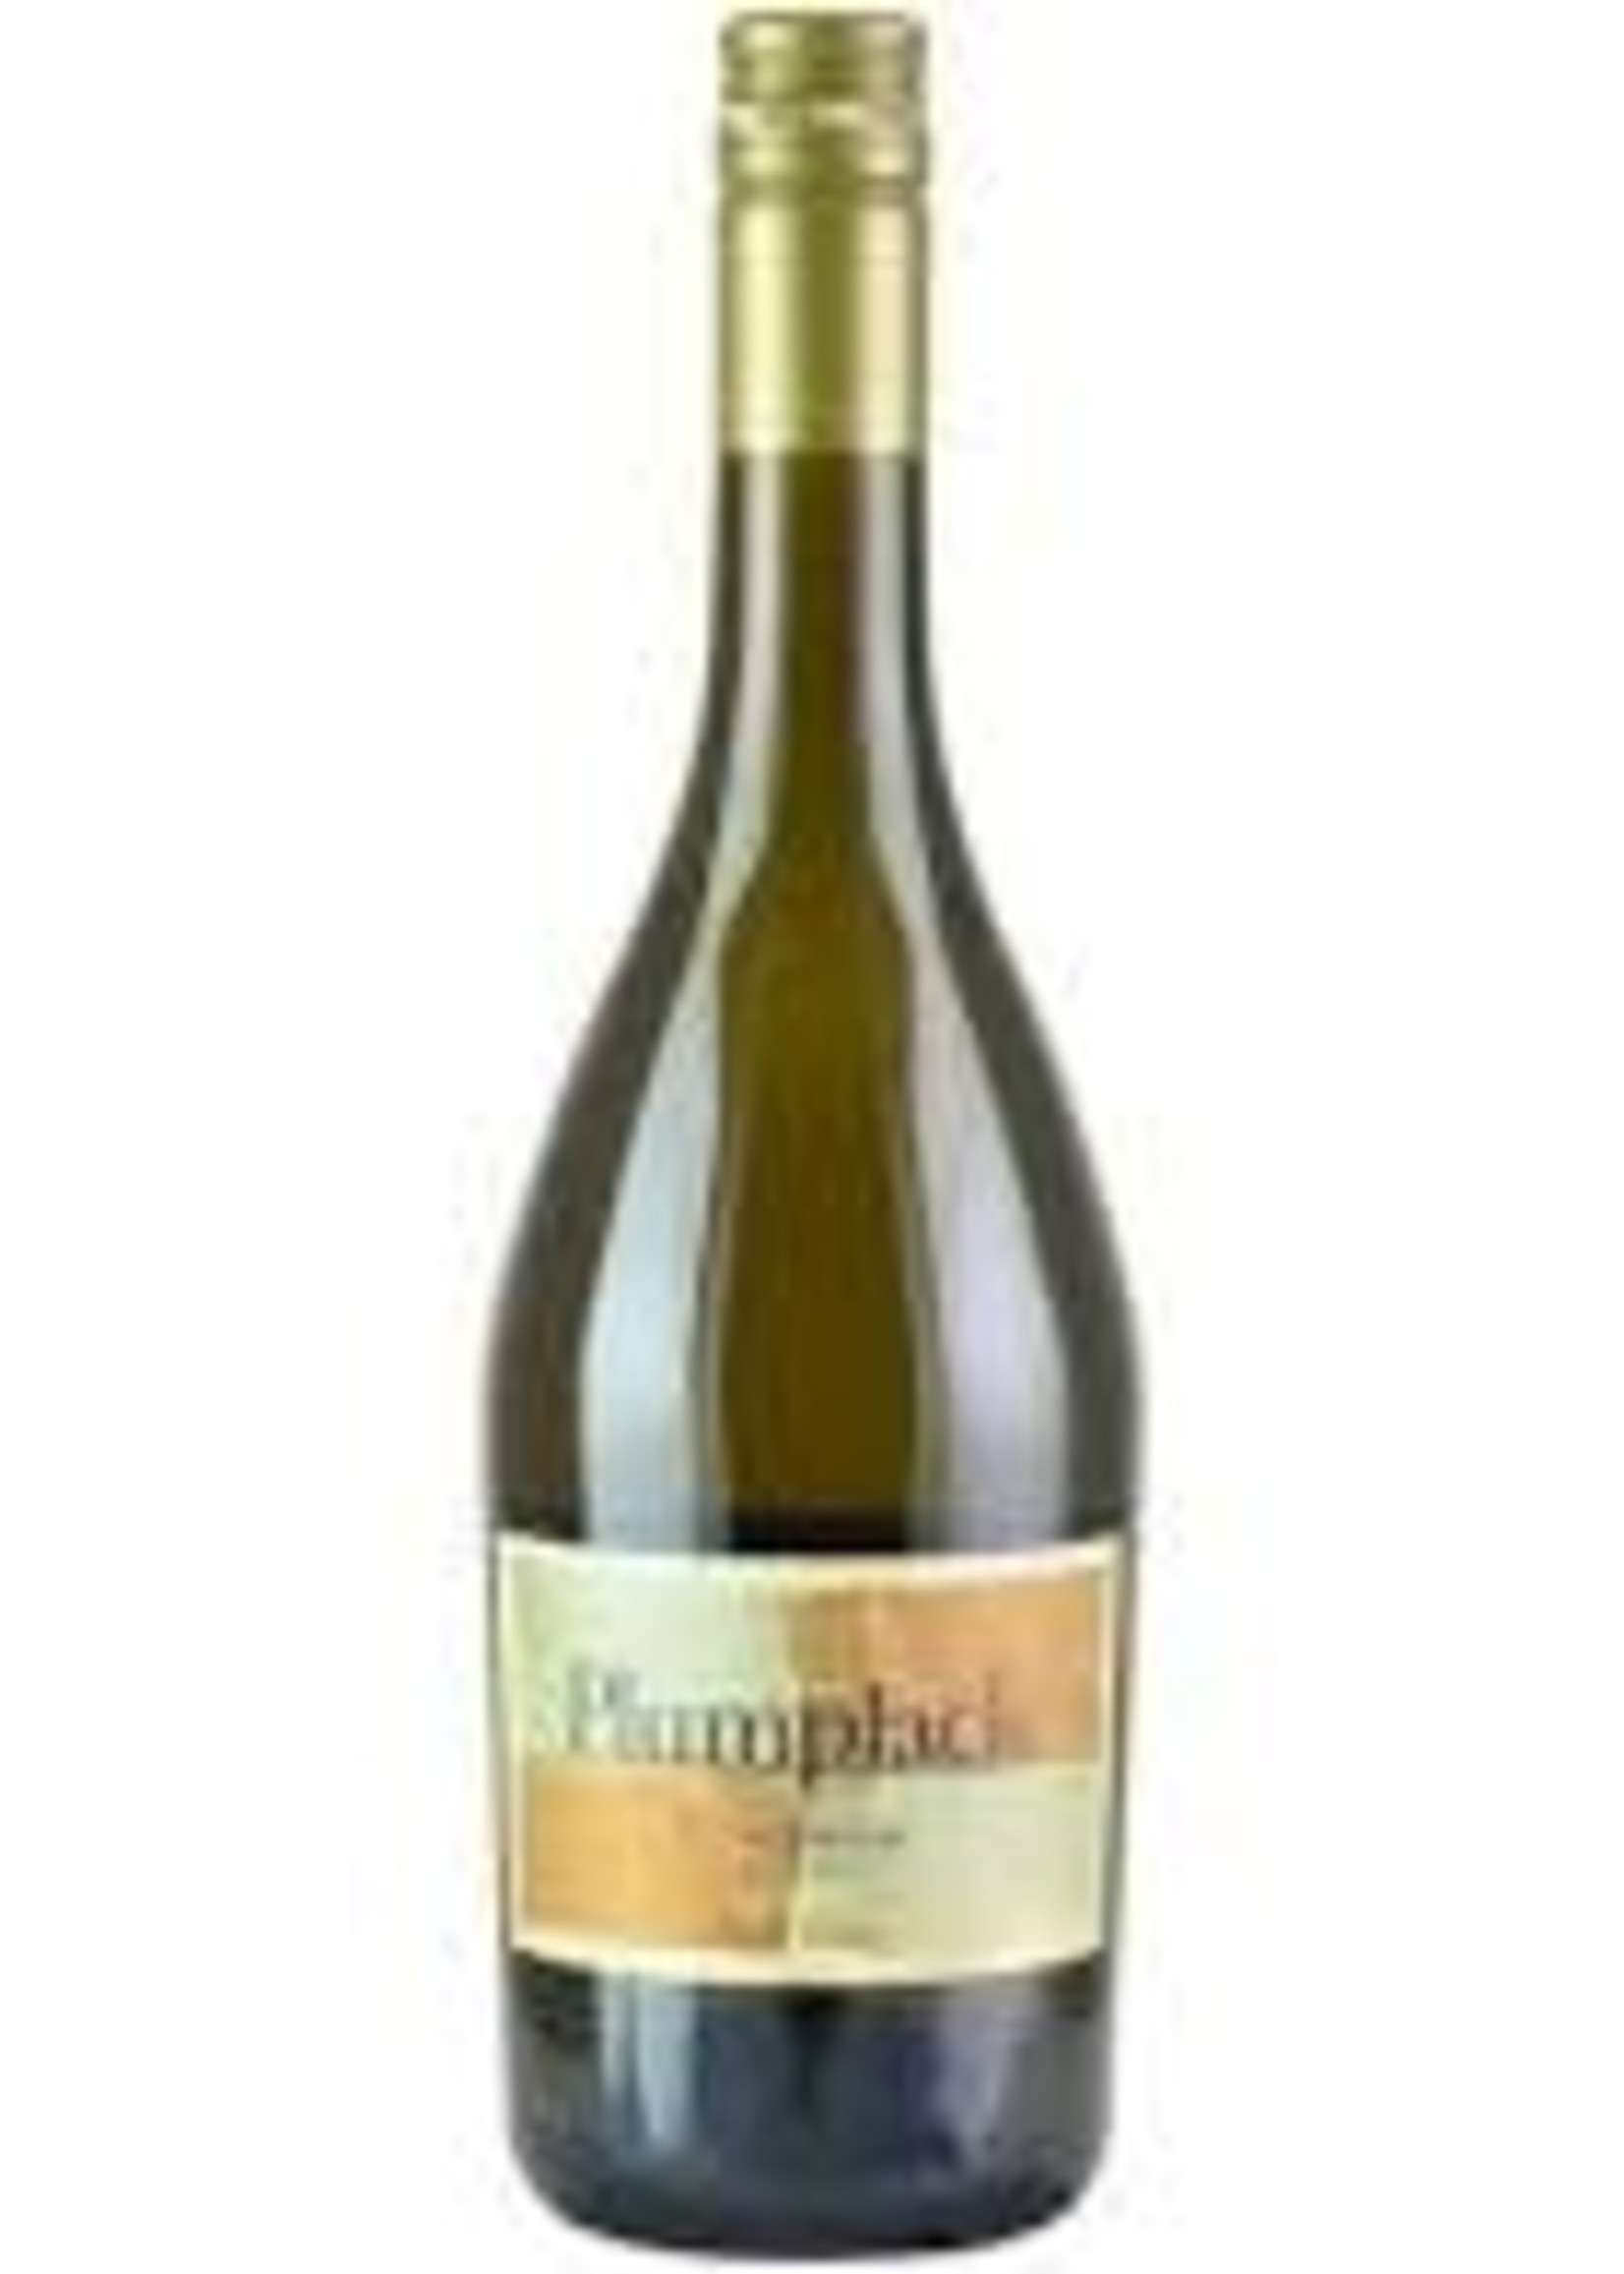 Plumpjack 2018 Chardonnay Reserve Screwcap